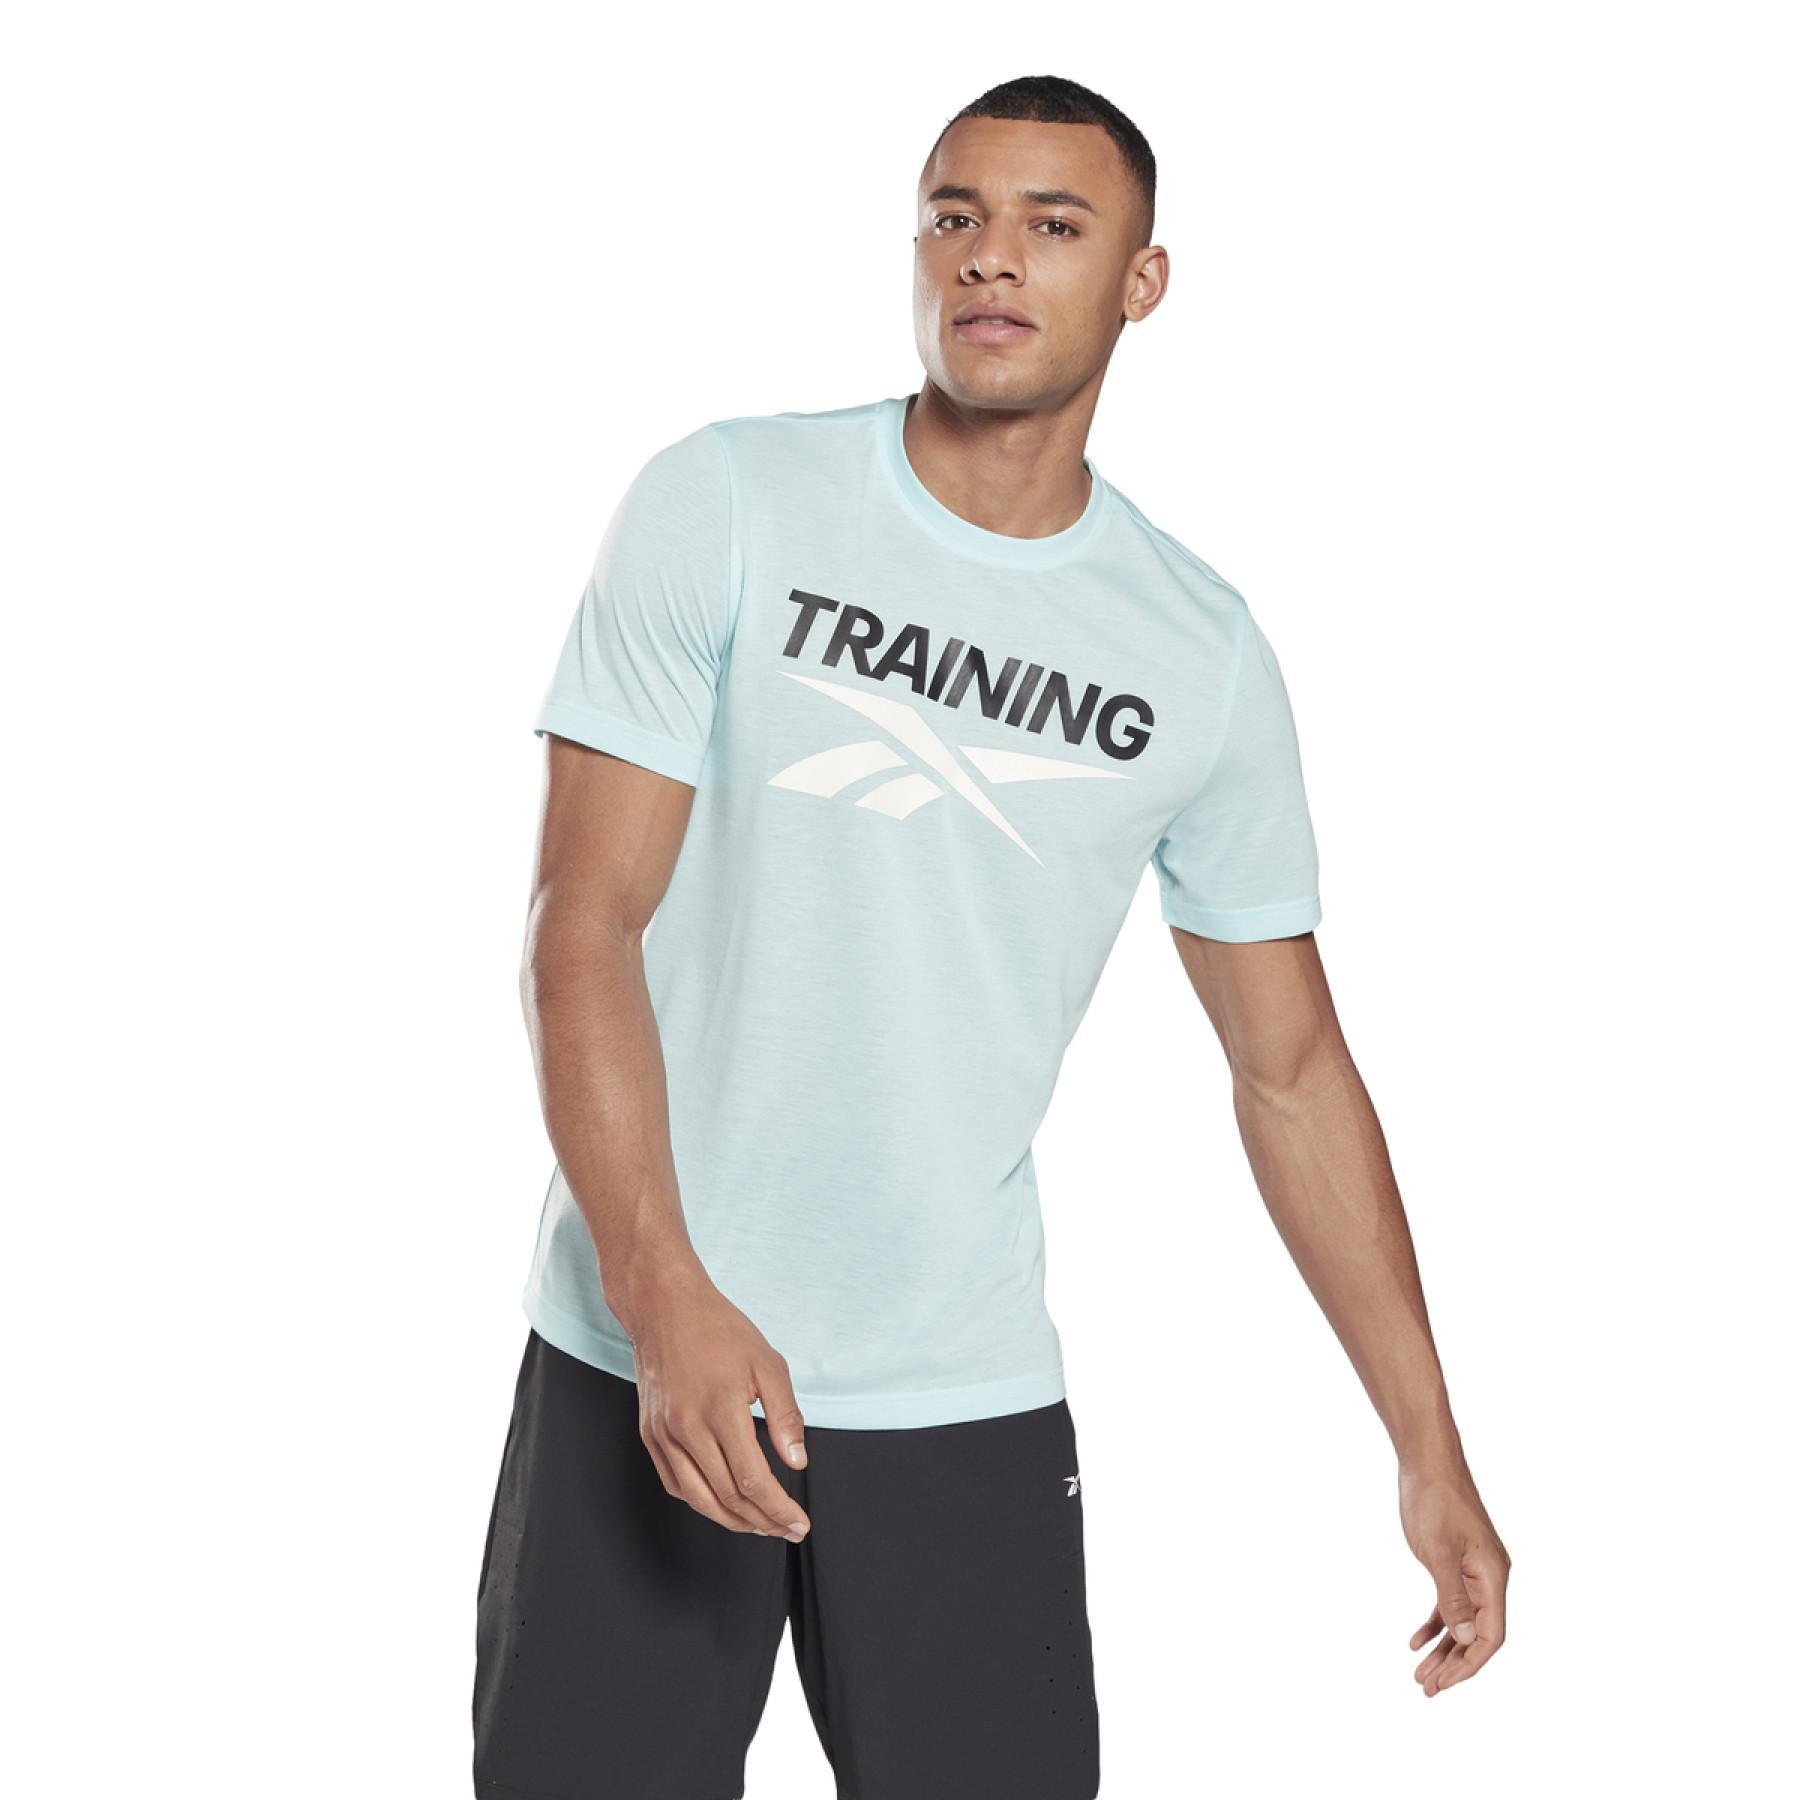 Reebok Training Vector T-shirt